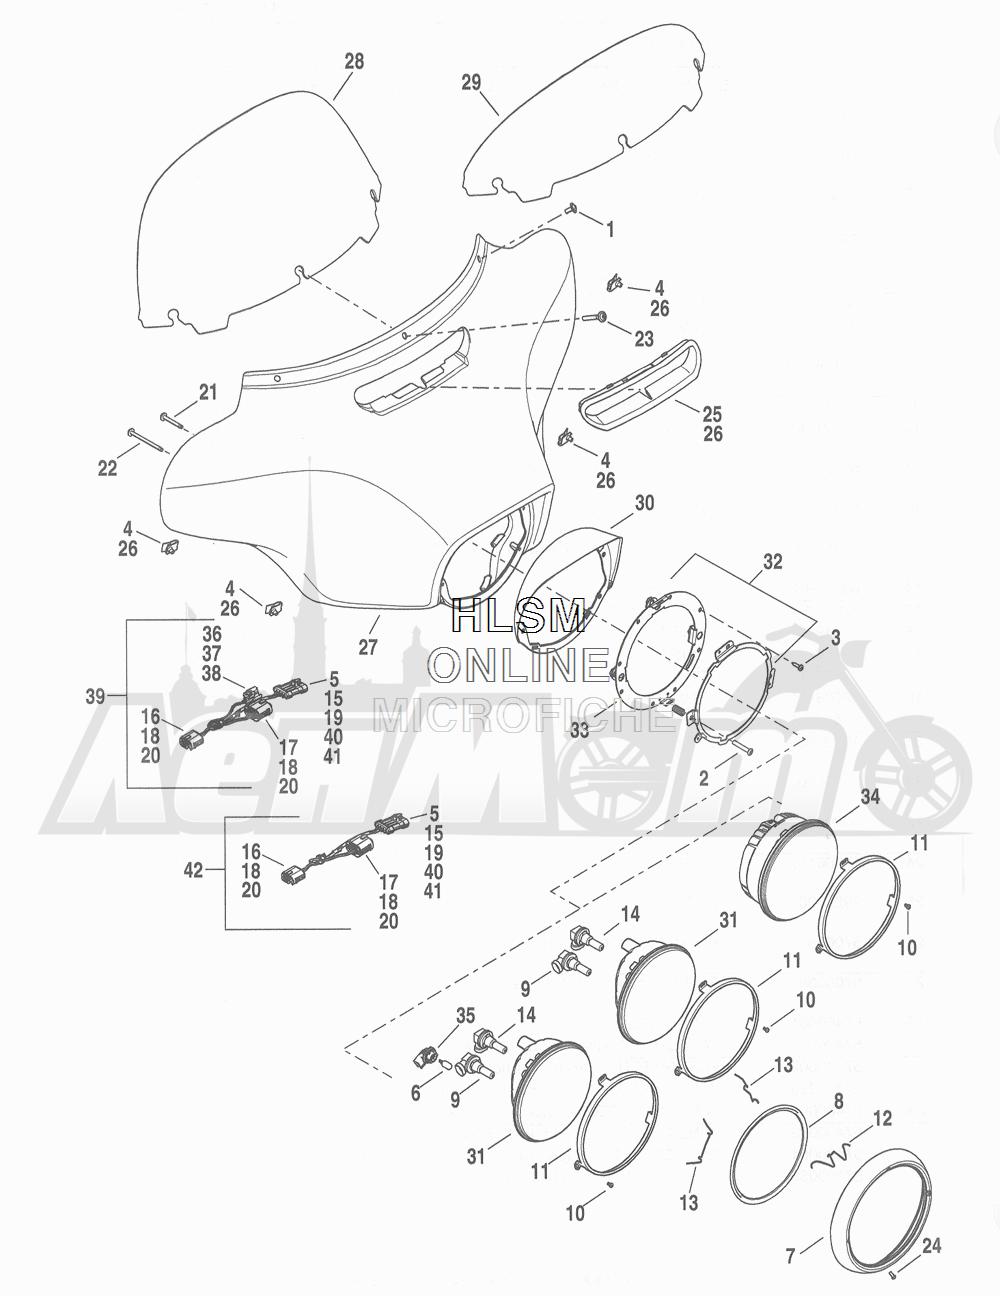 Запчасти для Мотоцикла Harley-Davidson 2016 FLHTCU 103 ULTRA CLASSIC ELECTRAGLIDE (FCM) Раздел: WINDSHIELDW/ FAIRING AND HEADLIGHT ASSEMBLY | WINDSHIELDw/ обтекатель и передняя фара в сборе